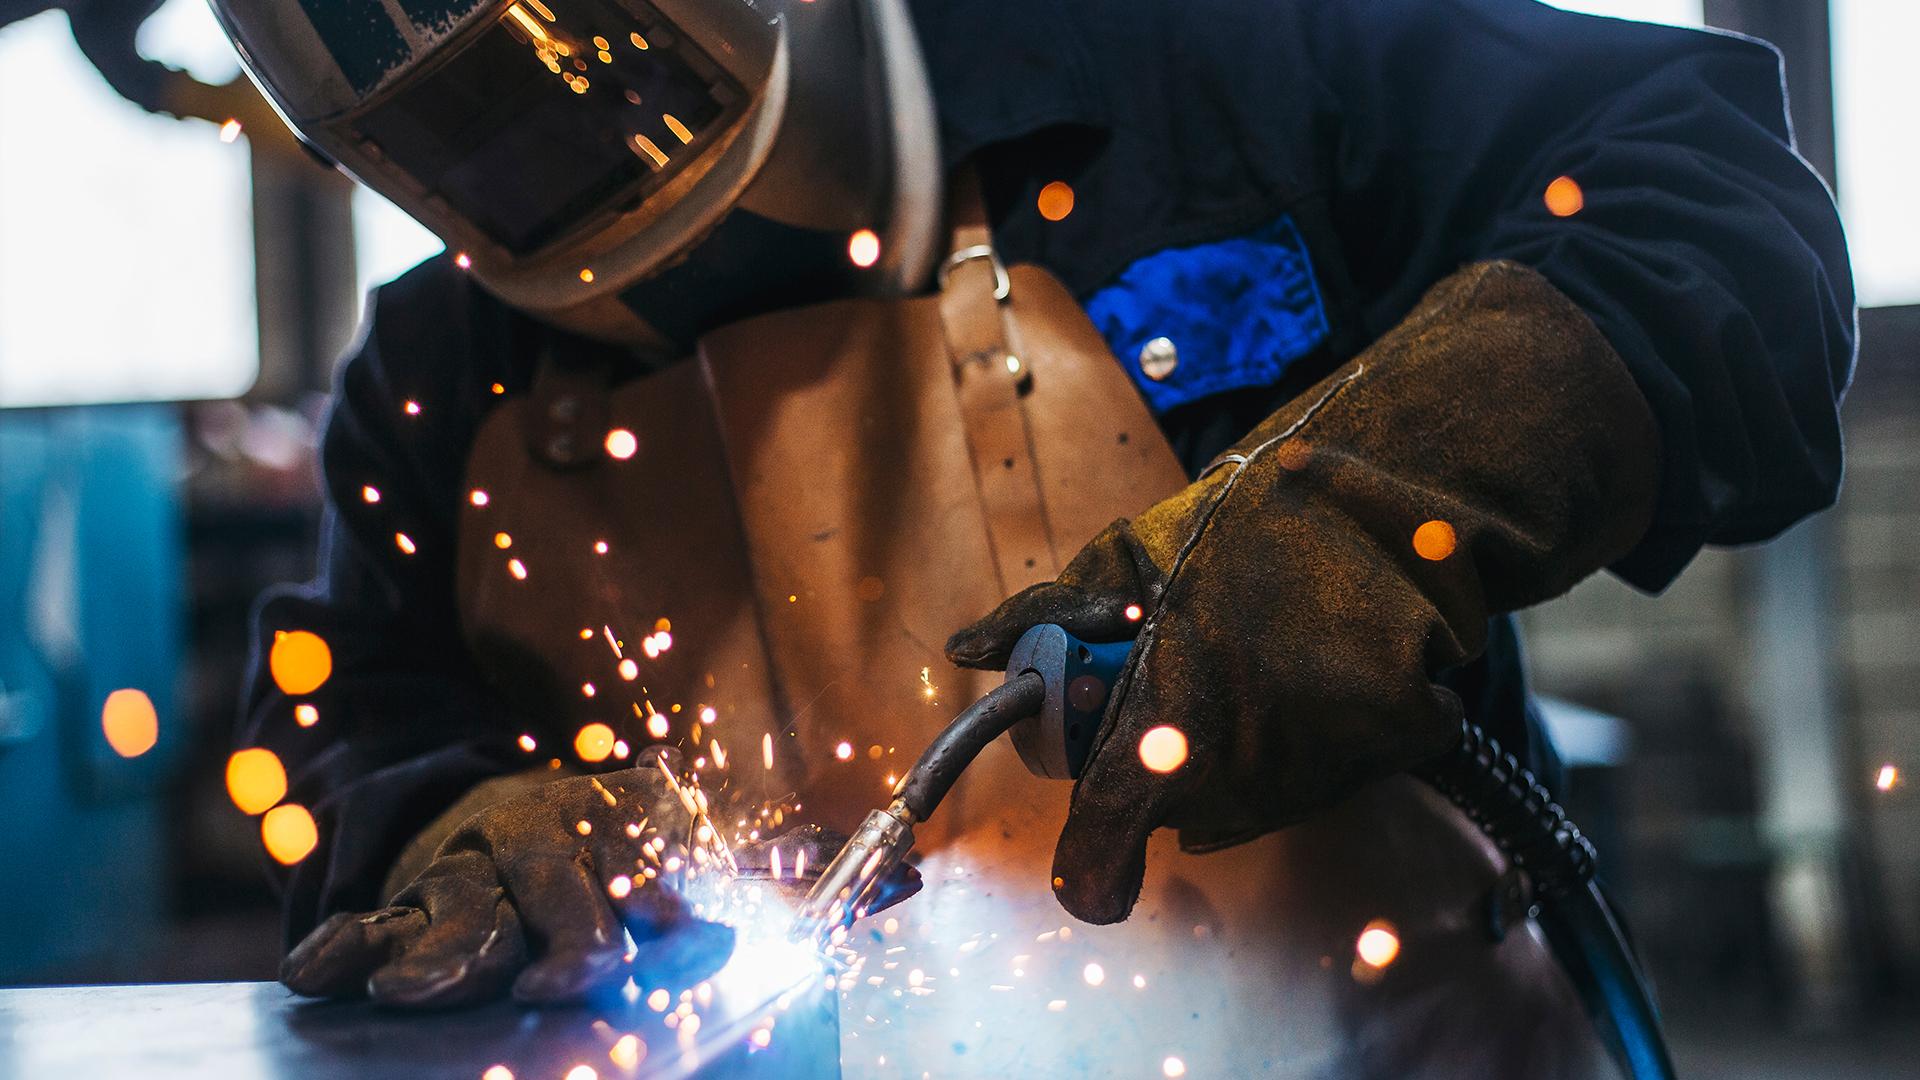 Person welding